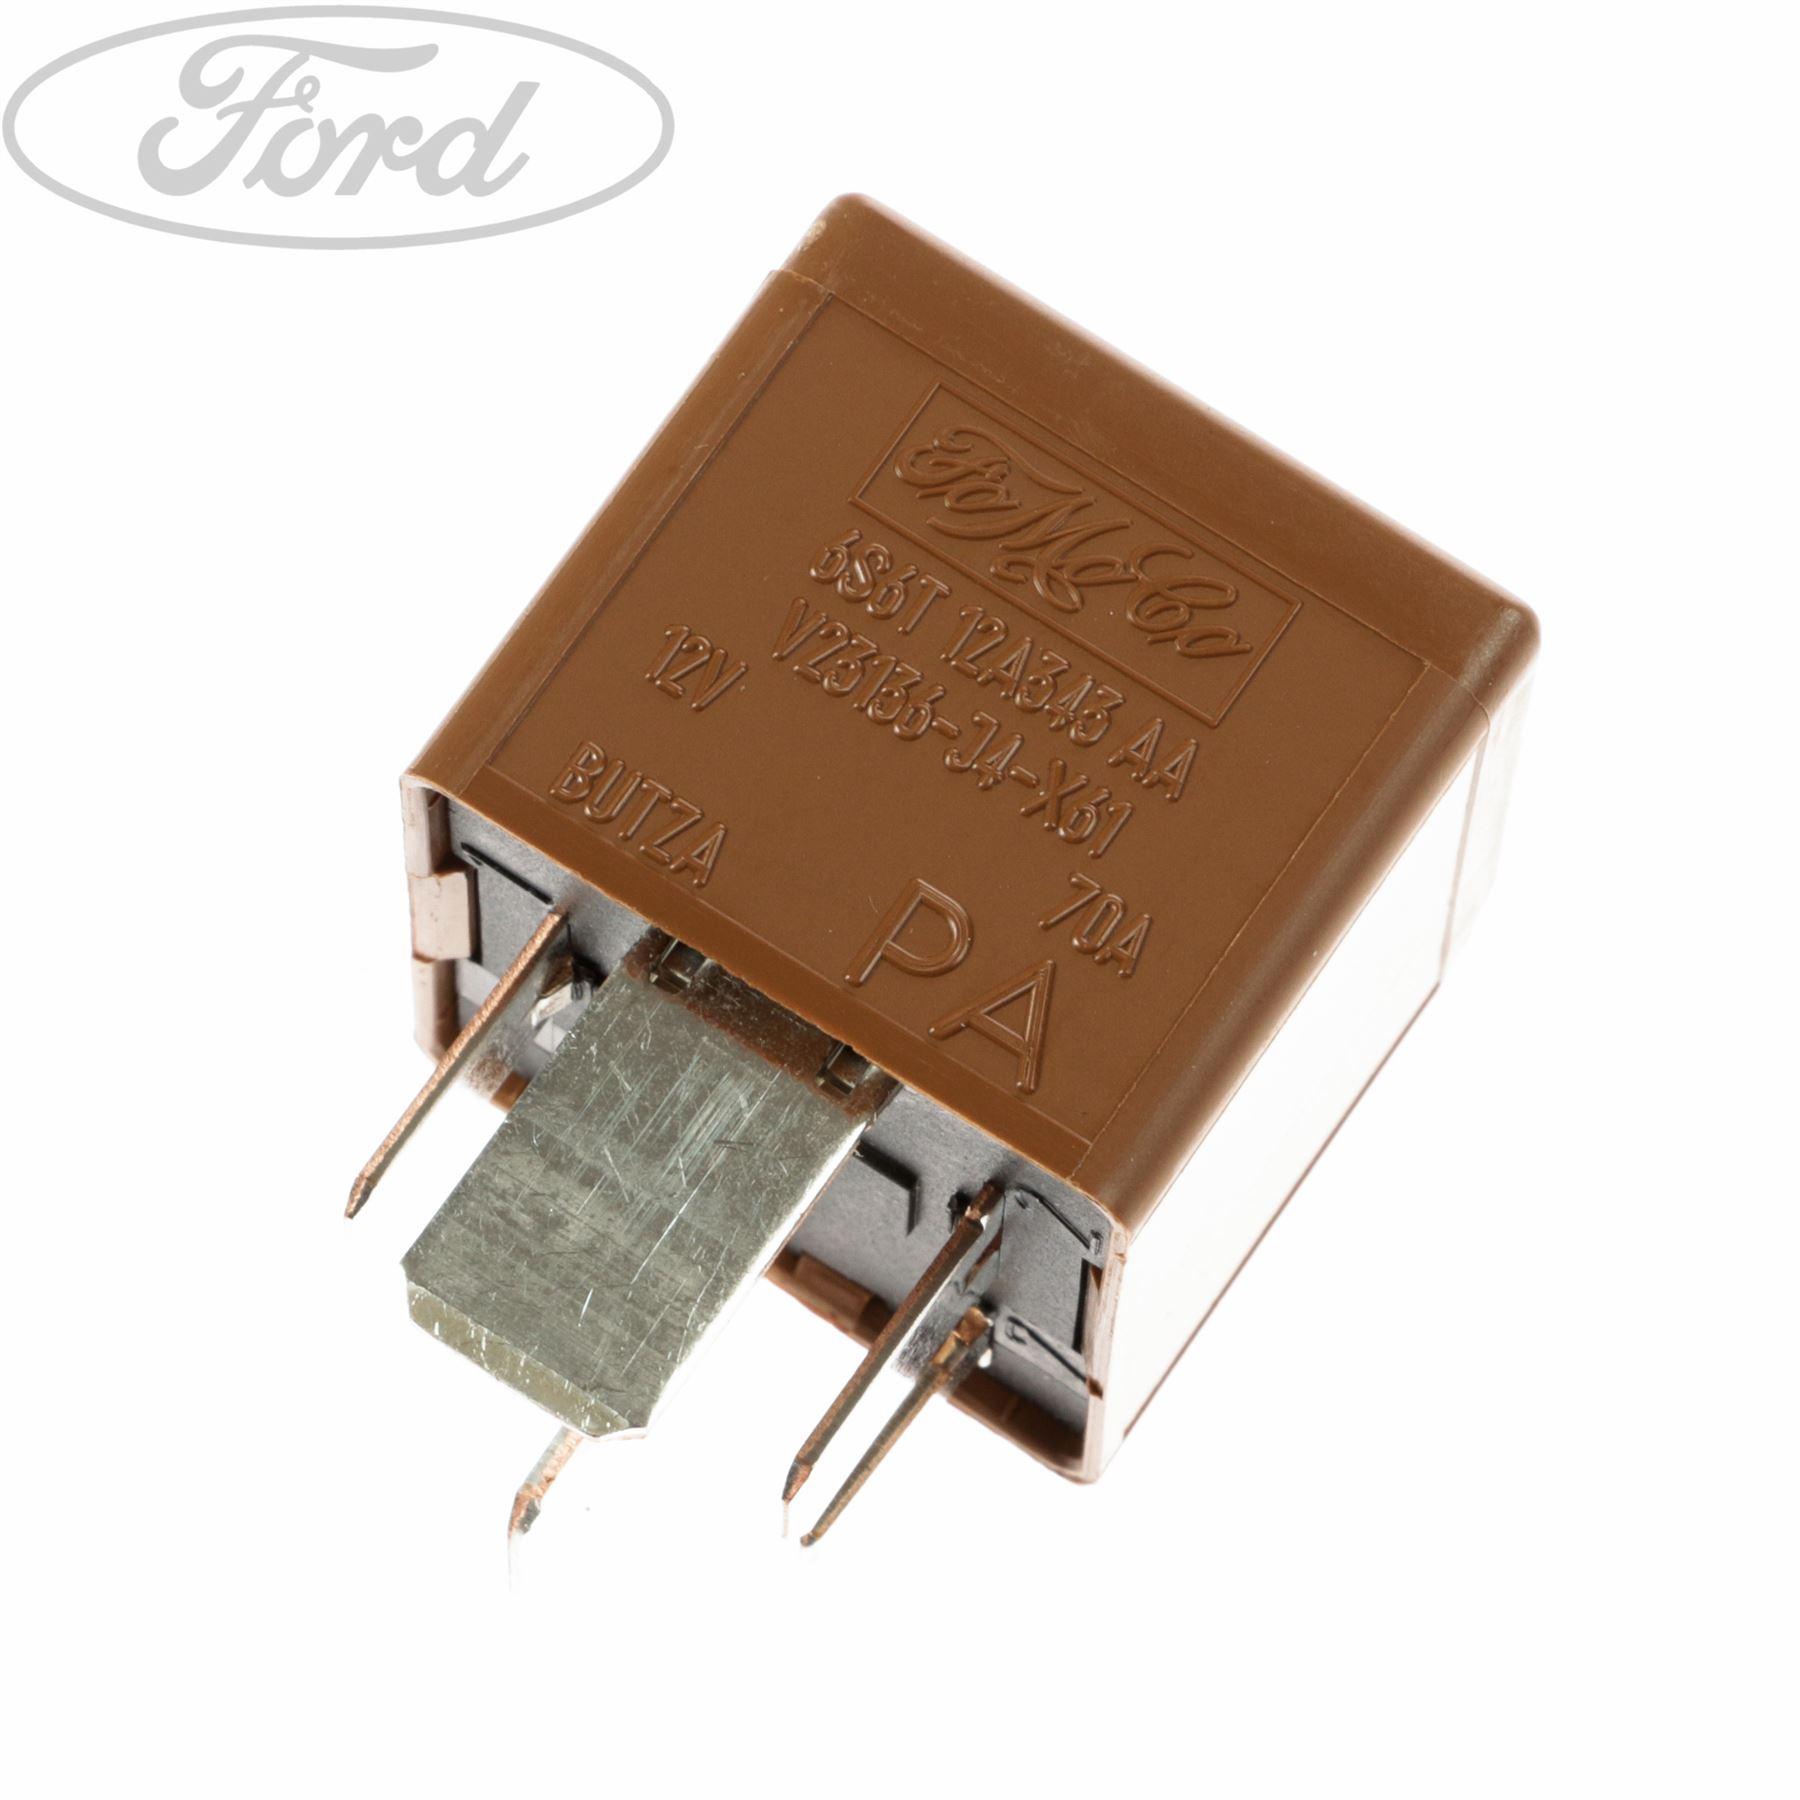 Genuine Ford Fiesta Mk5 Mk6 Heater Glow Plug Relay 5 Blade